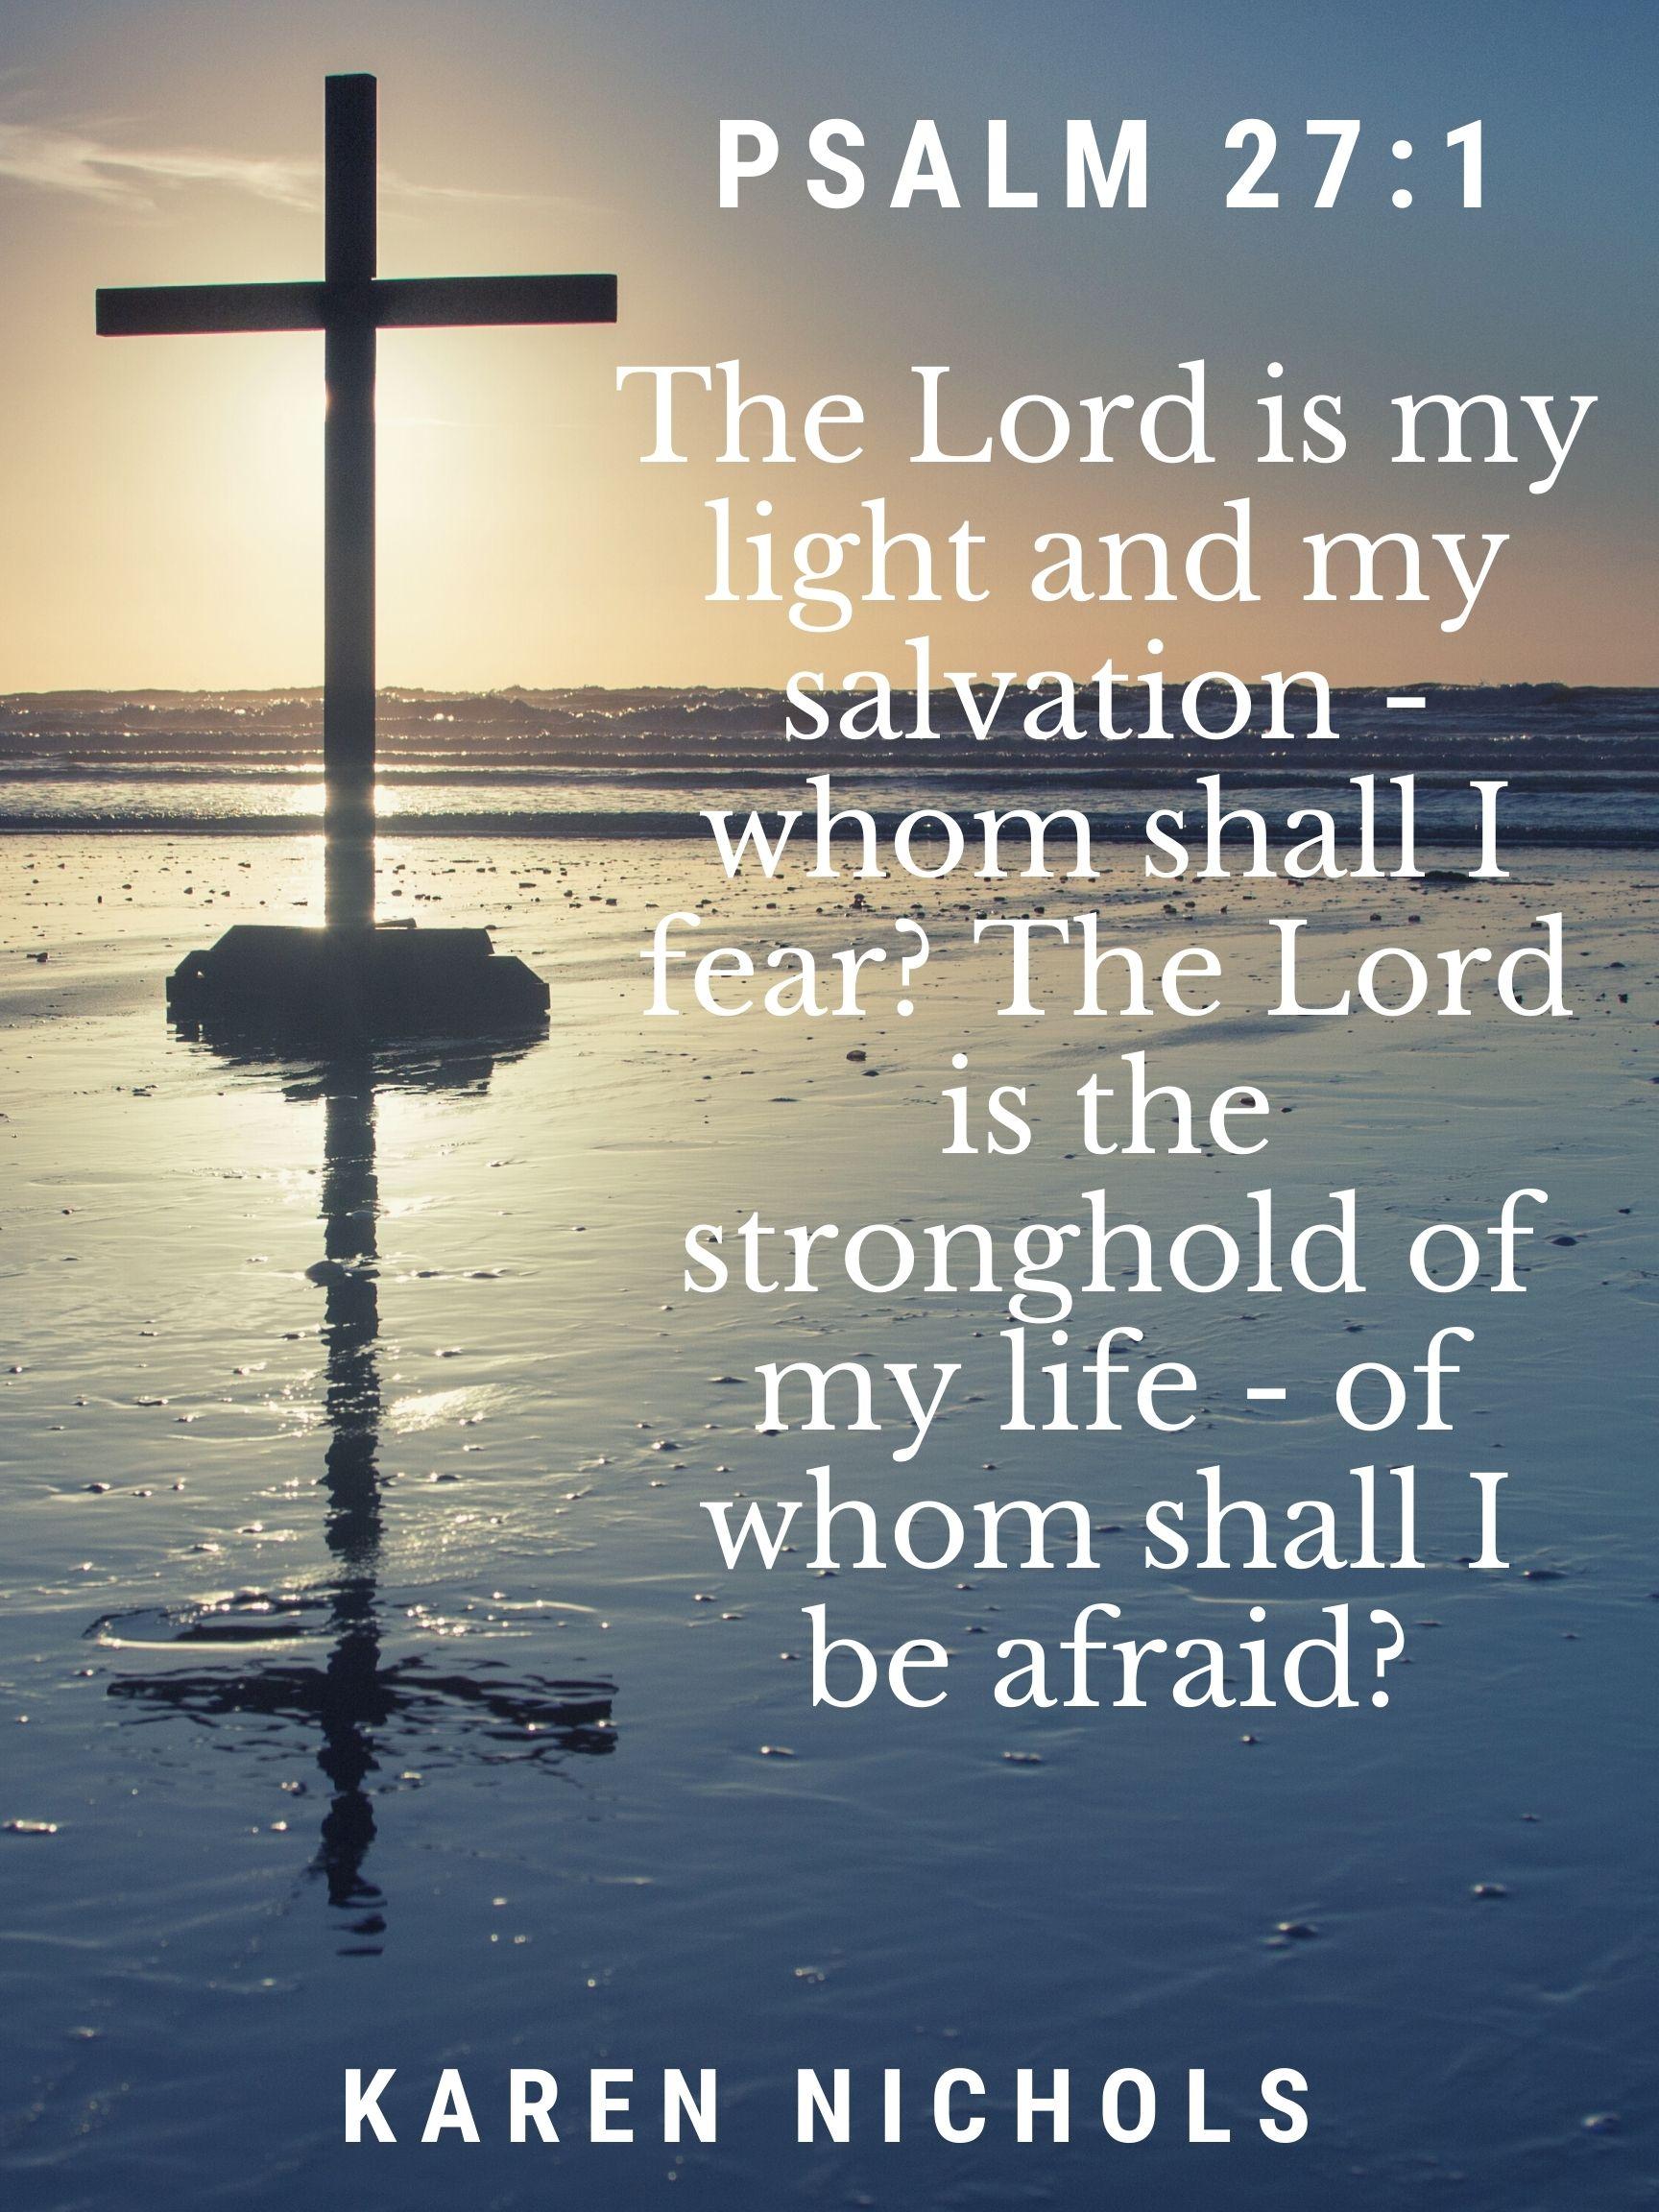 Psalm 27: 1